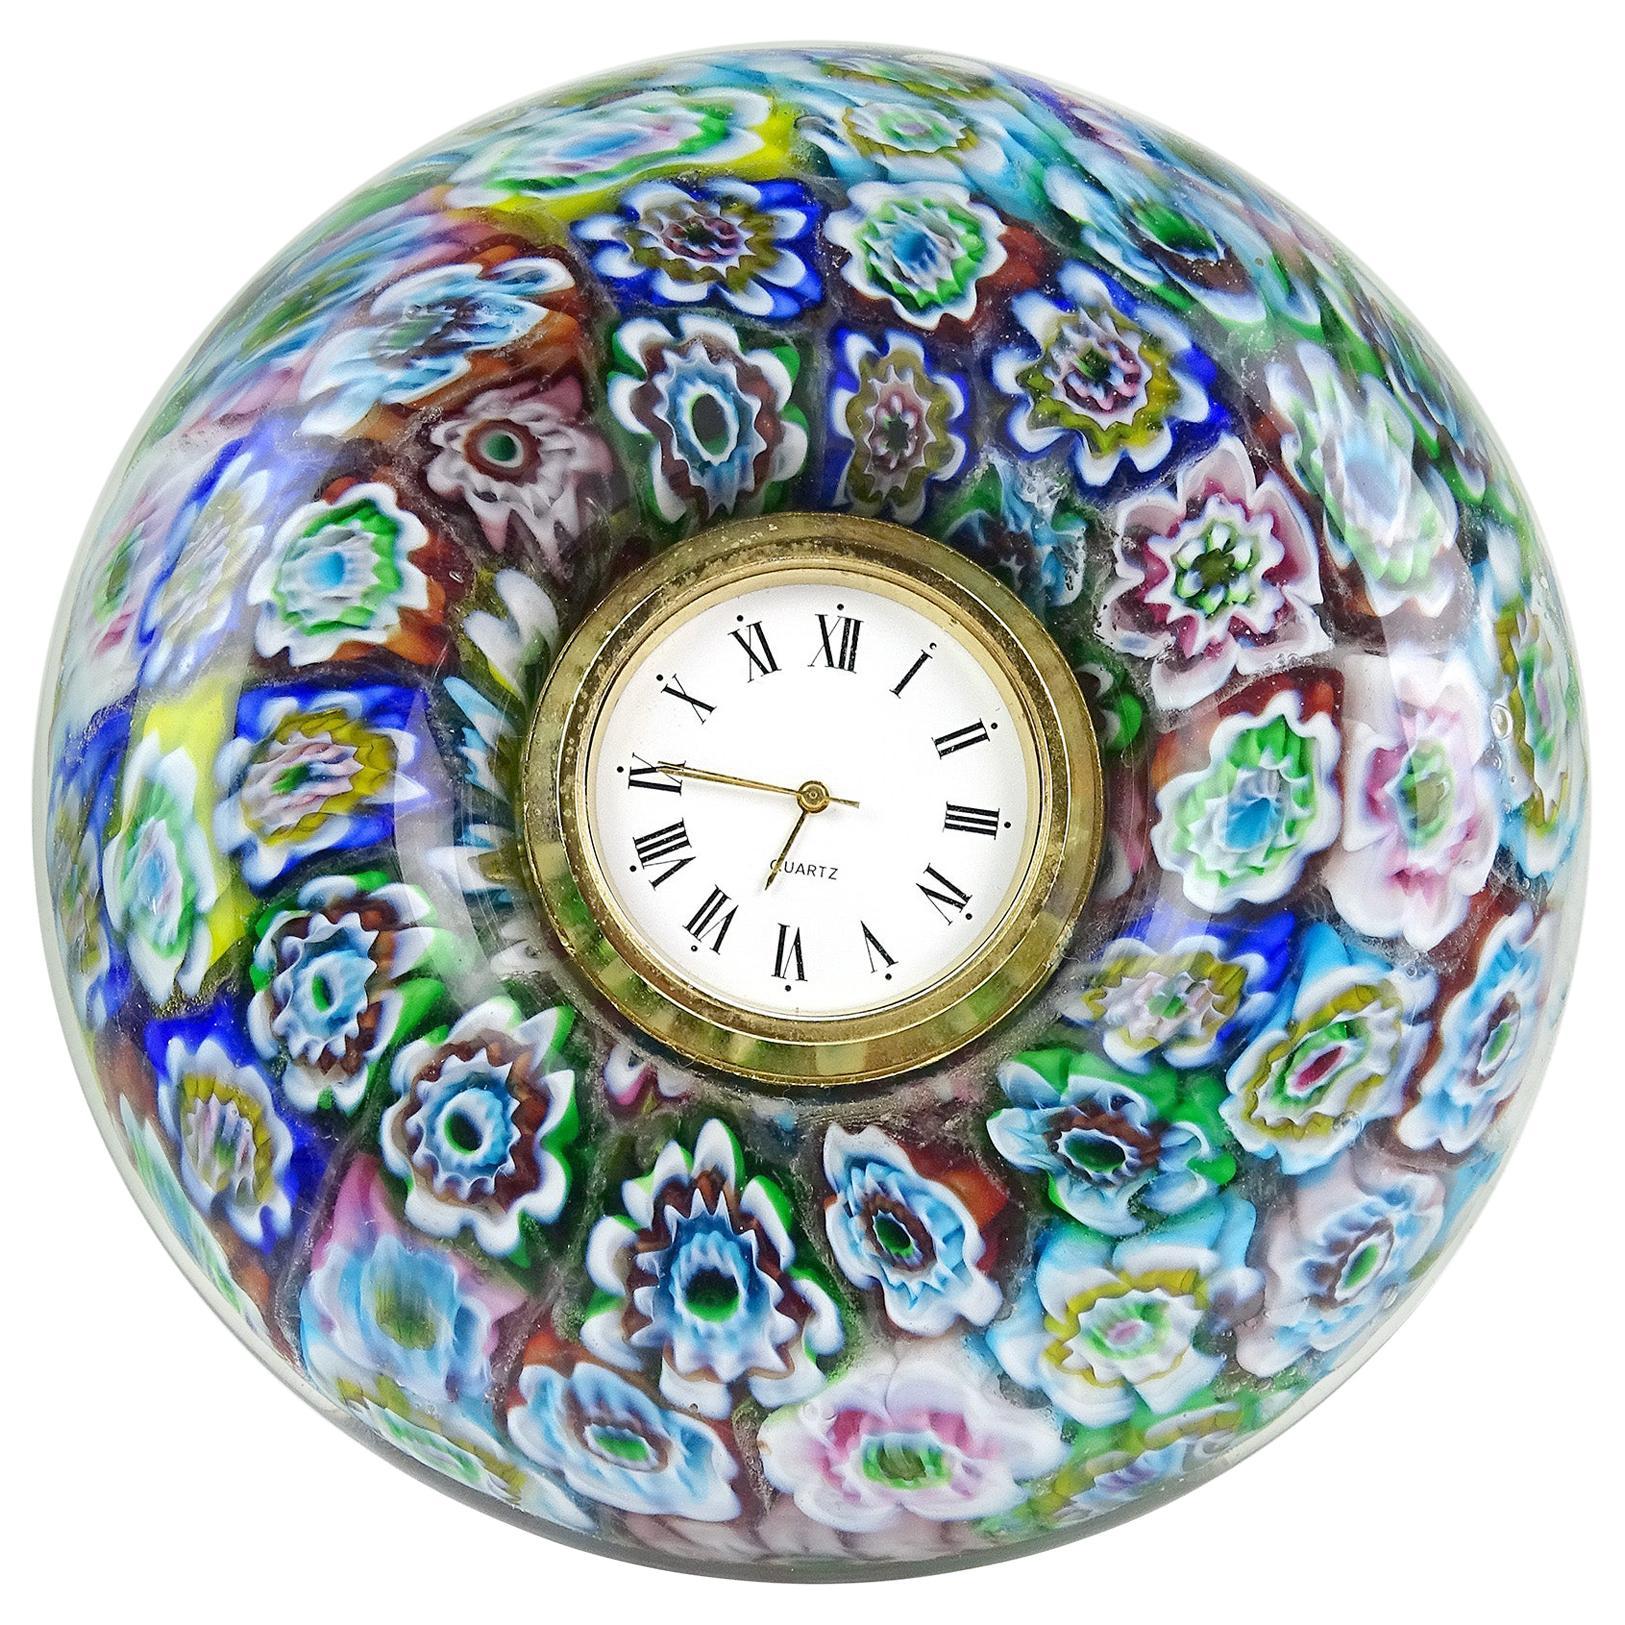 Murano Millefiori Mosaic Flowers Italian Art Glass Decorative Round Desk Clock